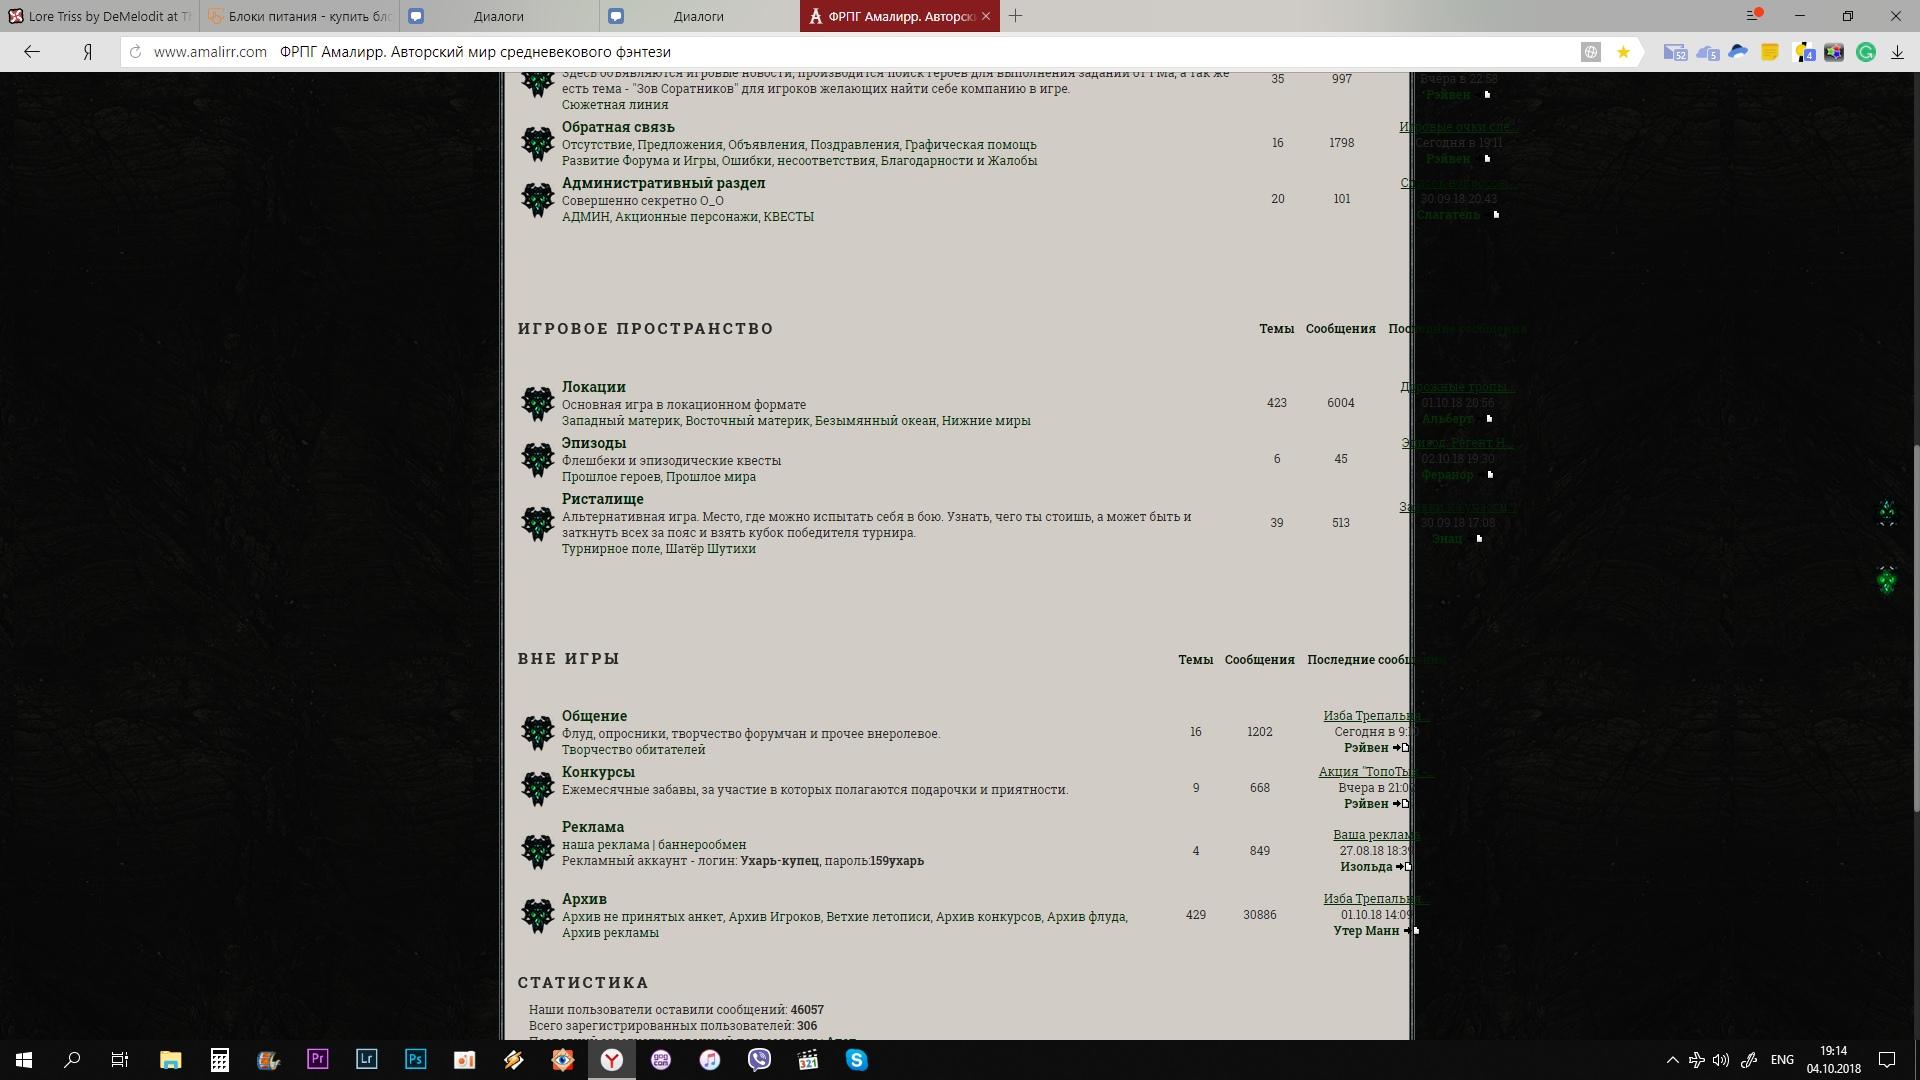 Ошибки/ Изъяны/ Недоработки форума - Страница 2 MMmBLPpYjHw